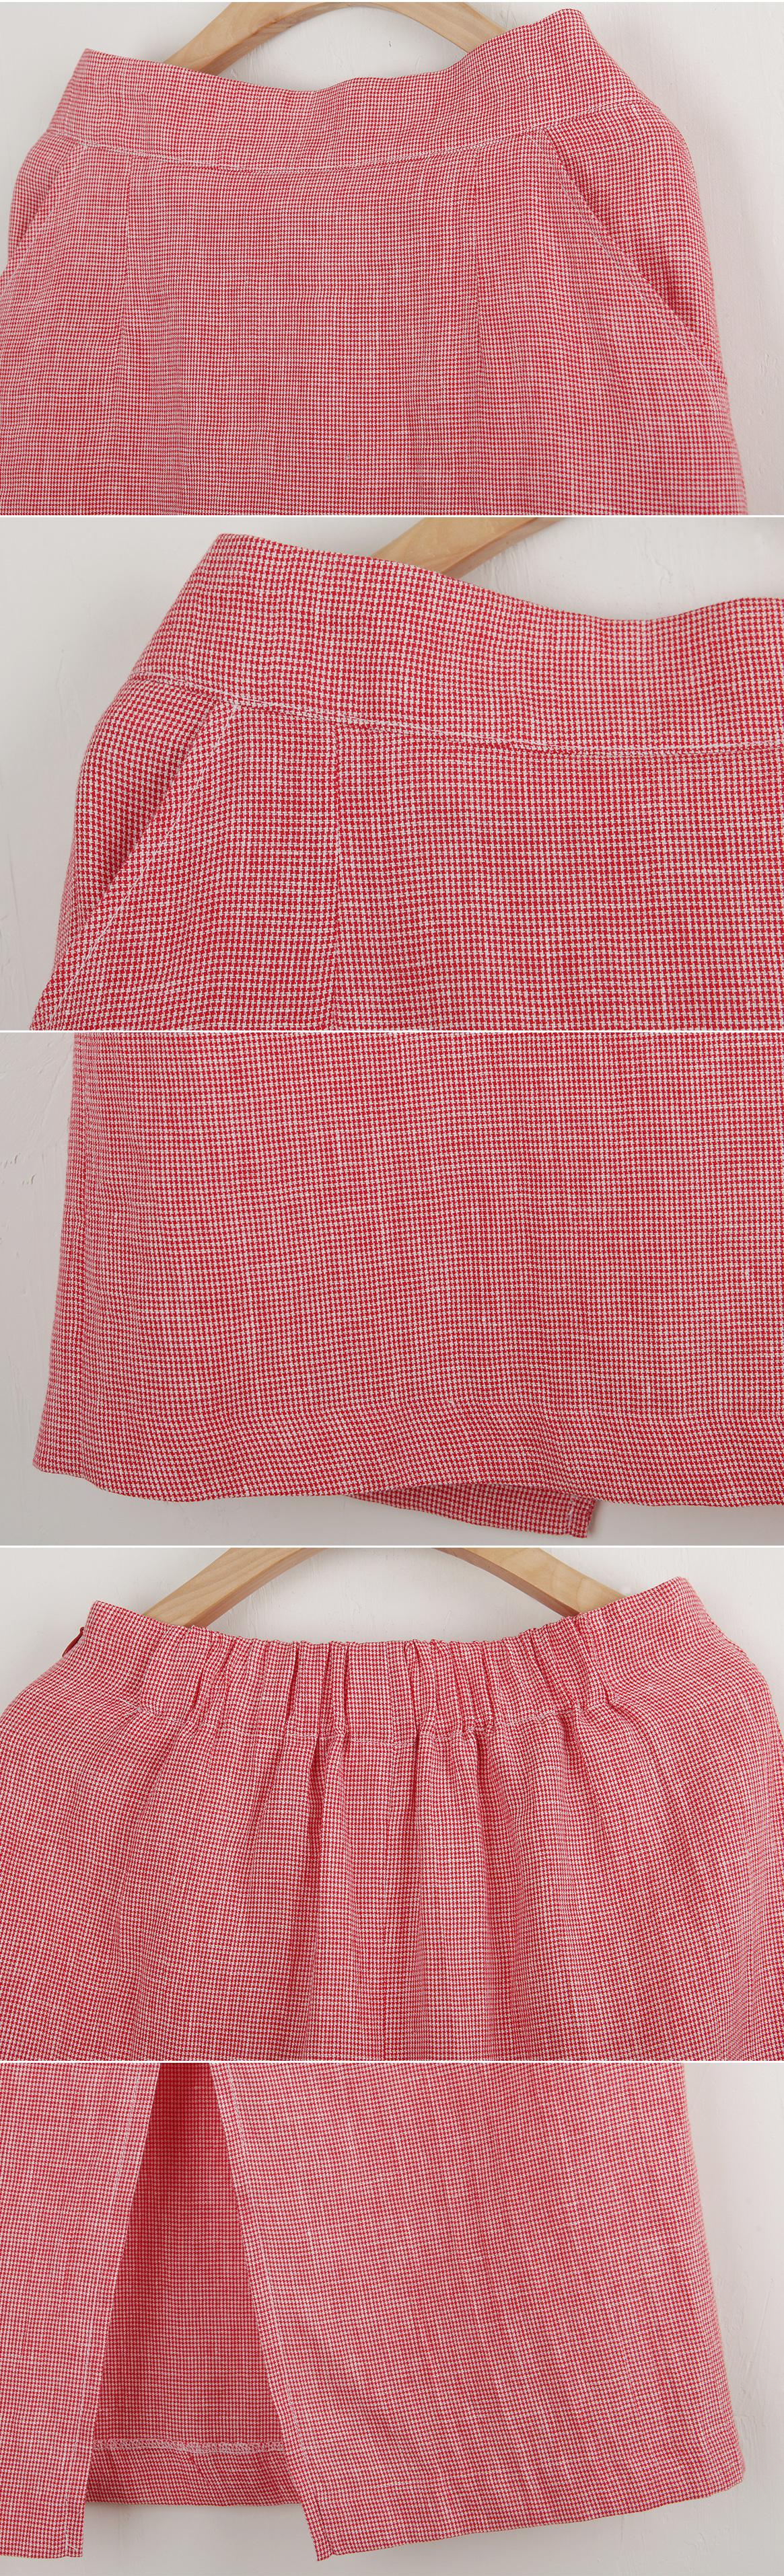 20% off Sale Pretty calm check linen skirt